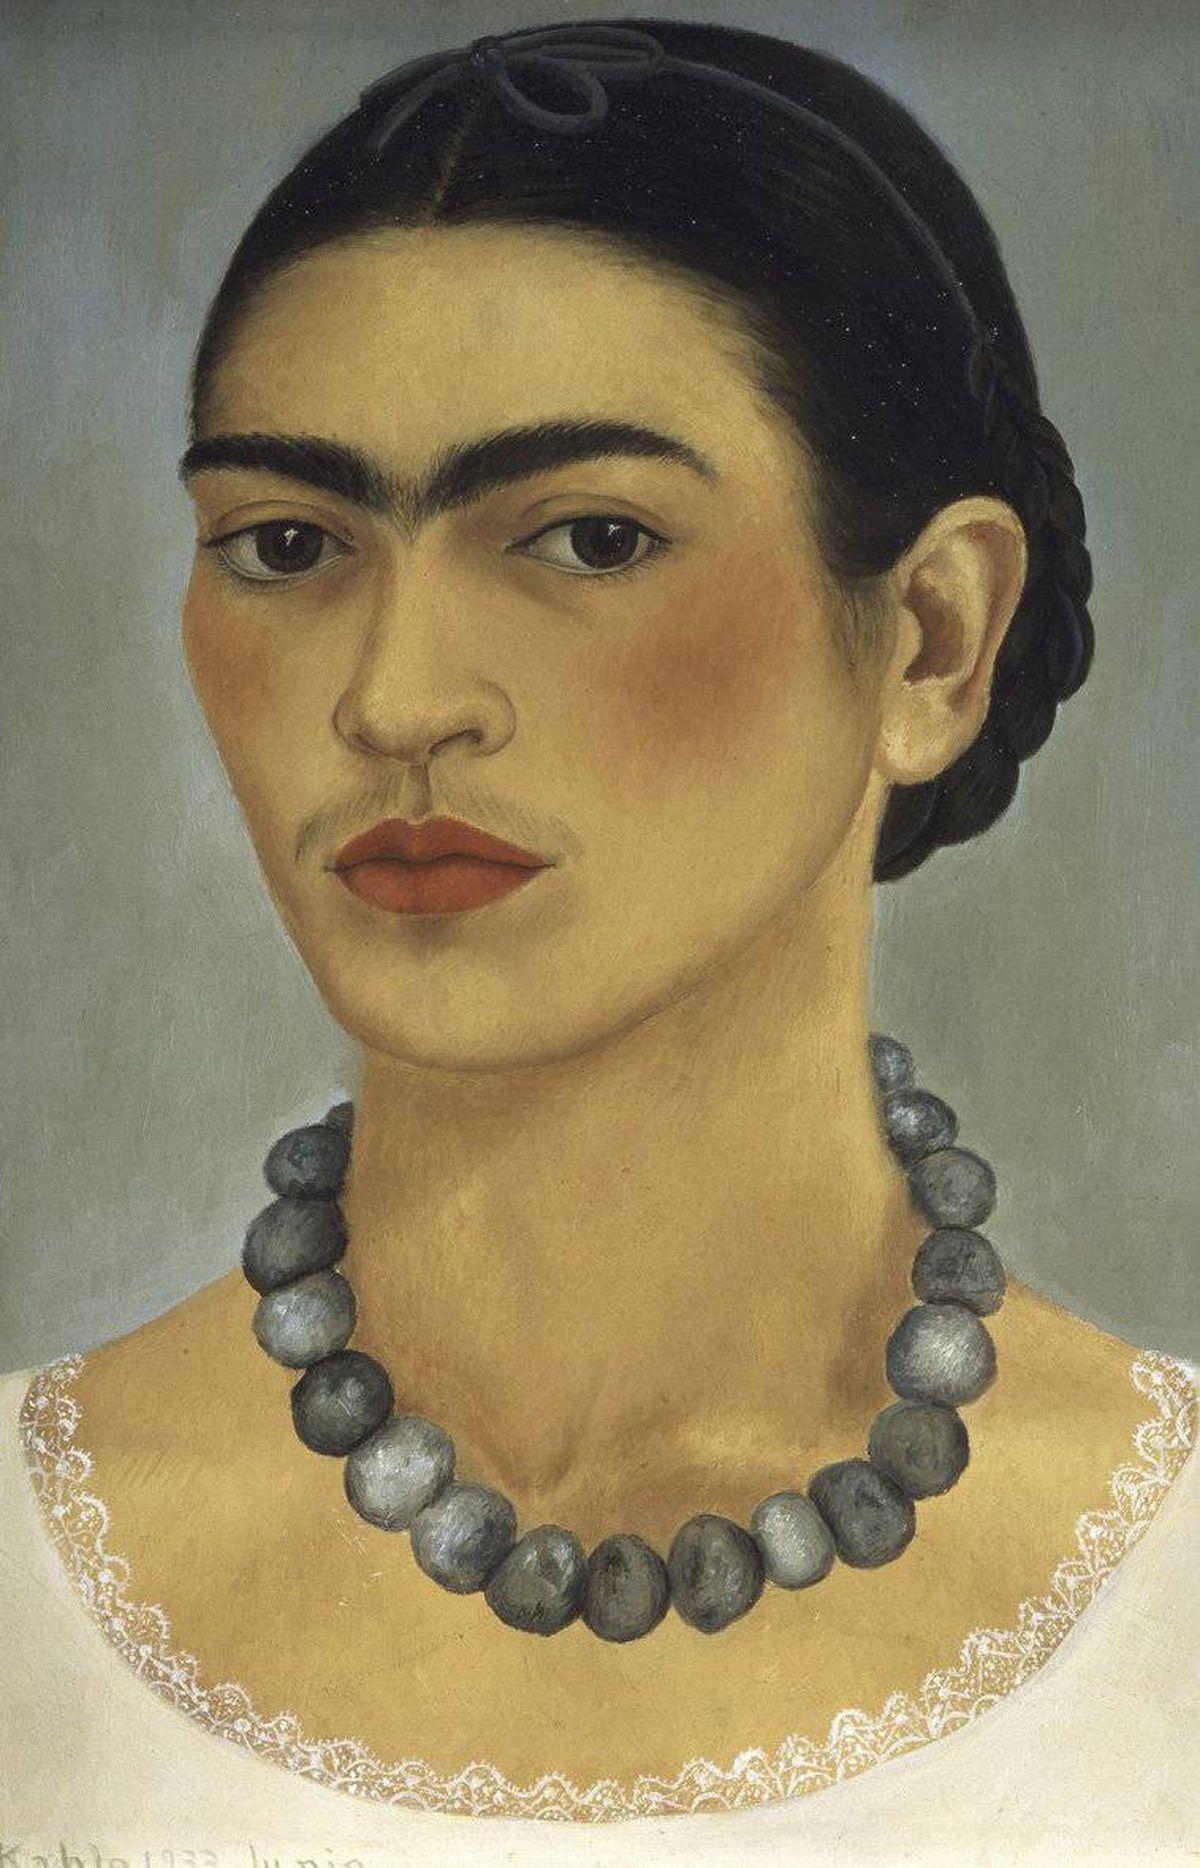 Frida Kahlo: High-brow artist